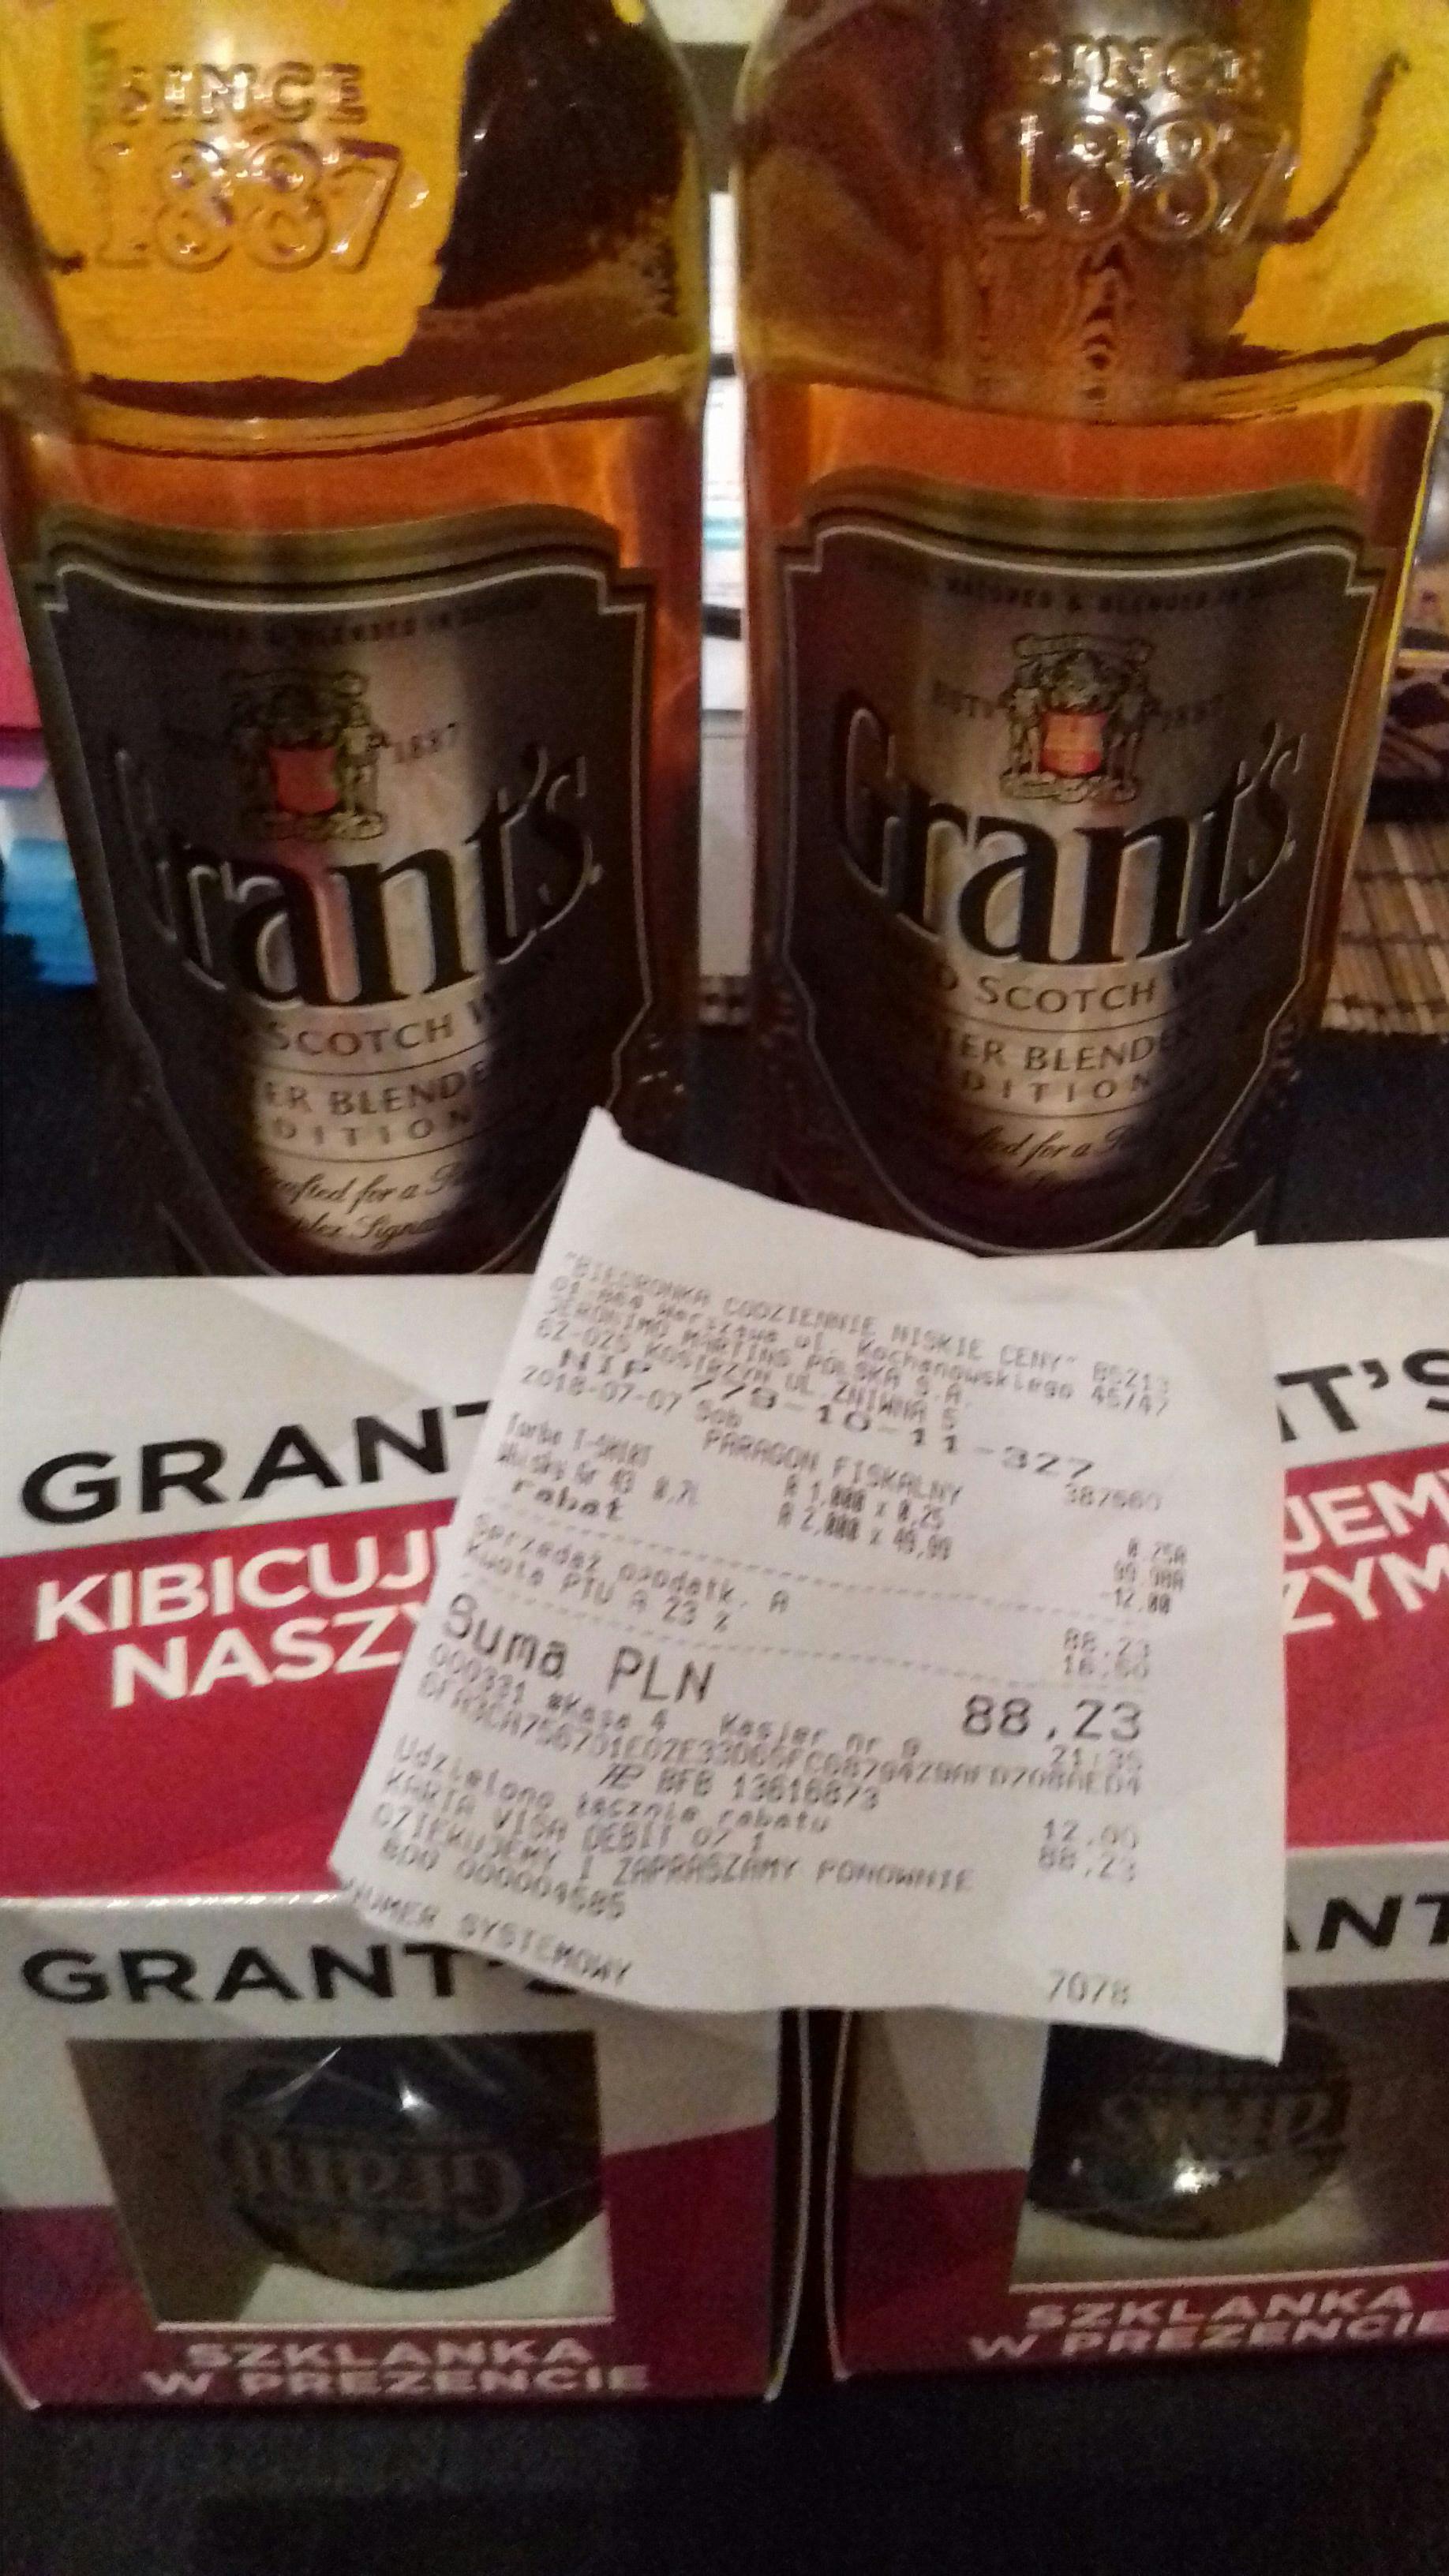 Grant's master Blender's Edition 0.7l + szklanka za 43,99zl (przy zakupie dwóch butelek)